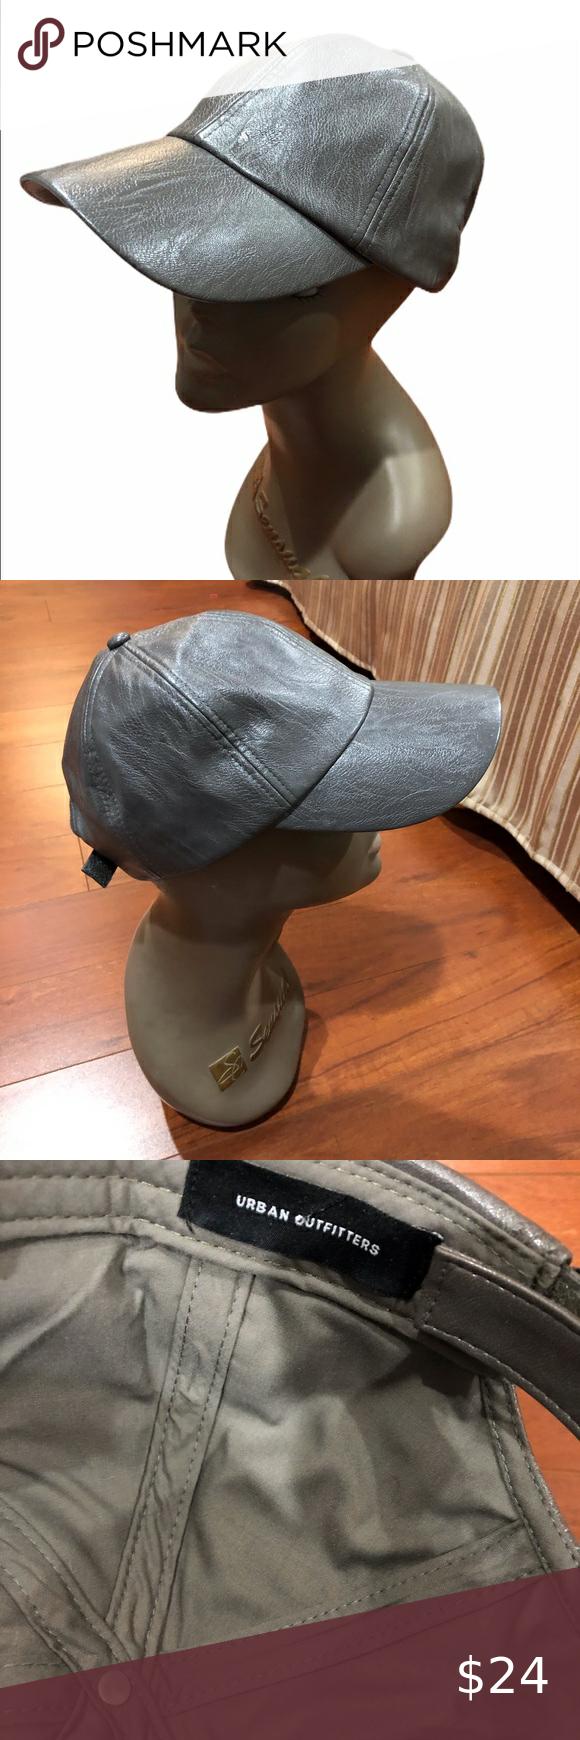 Urban Outfitters Grey Baseball Cap Hat Urban Outfitters Urban Outfitters Accessories Women Accessories Hats